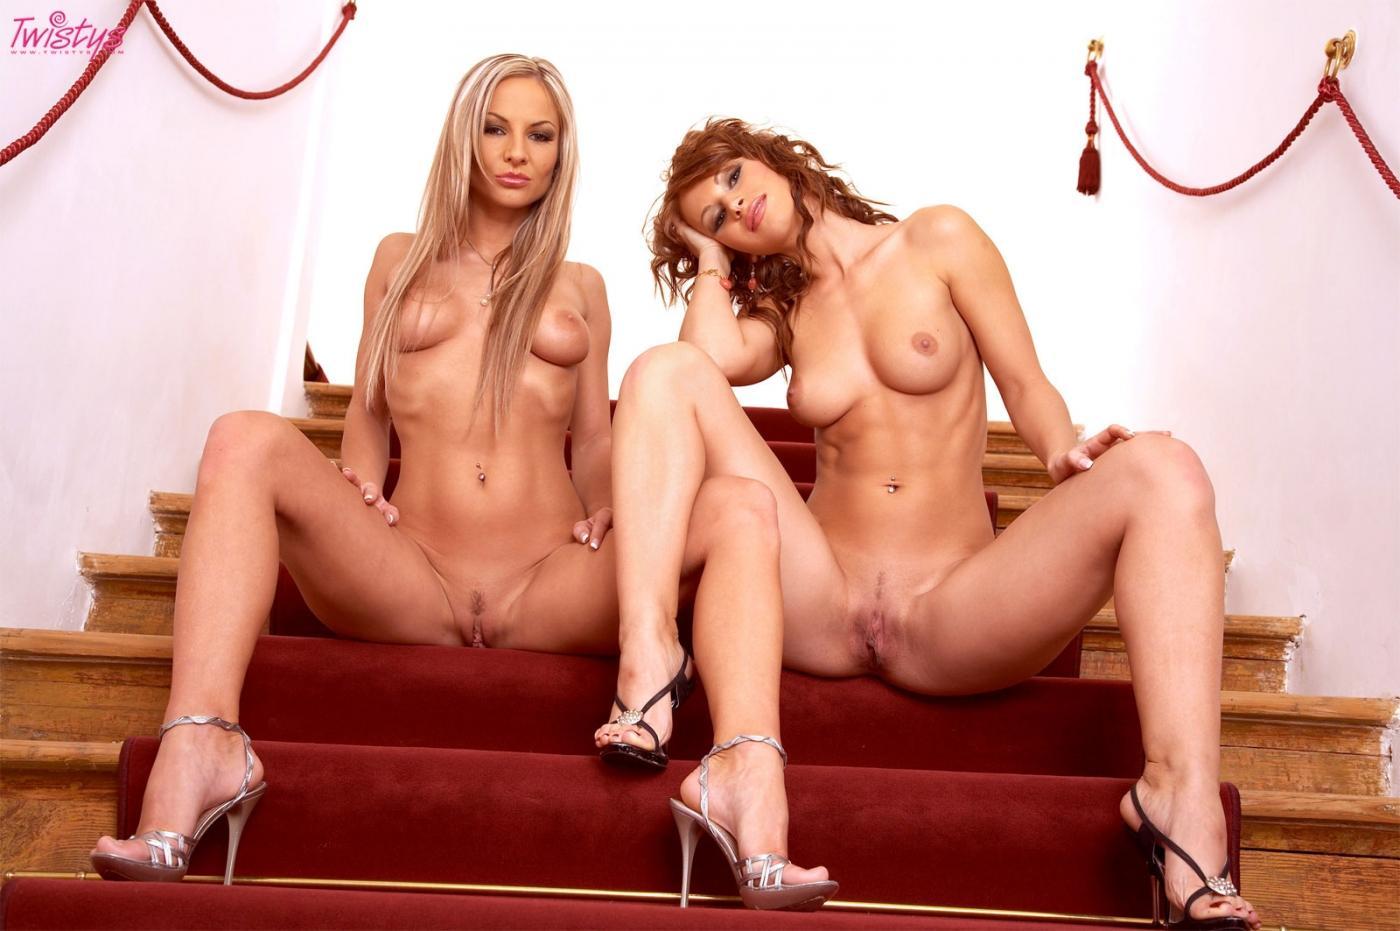 Богини-лесбиянки с стандартными телами Susana Spears и Vanessa Cooper обнажаются на лестнице